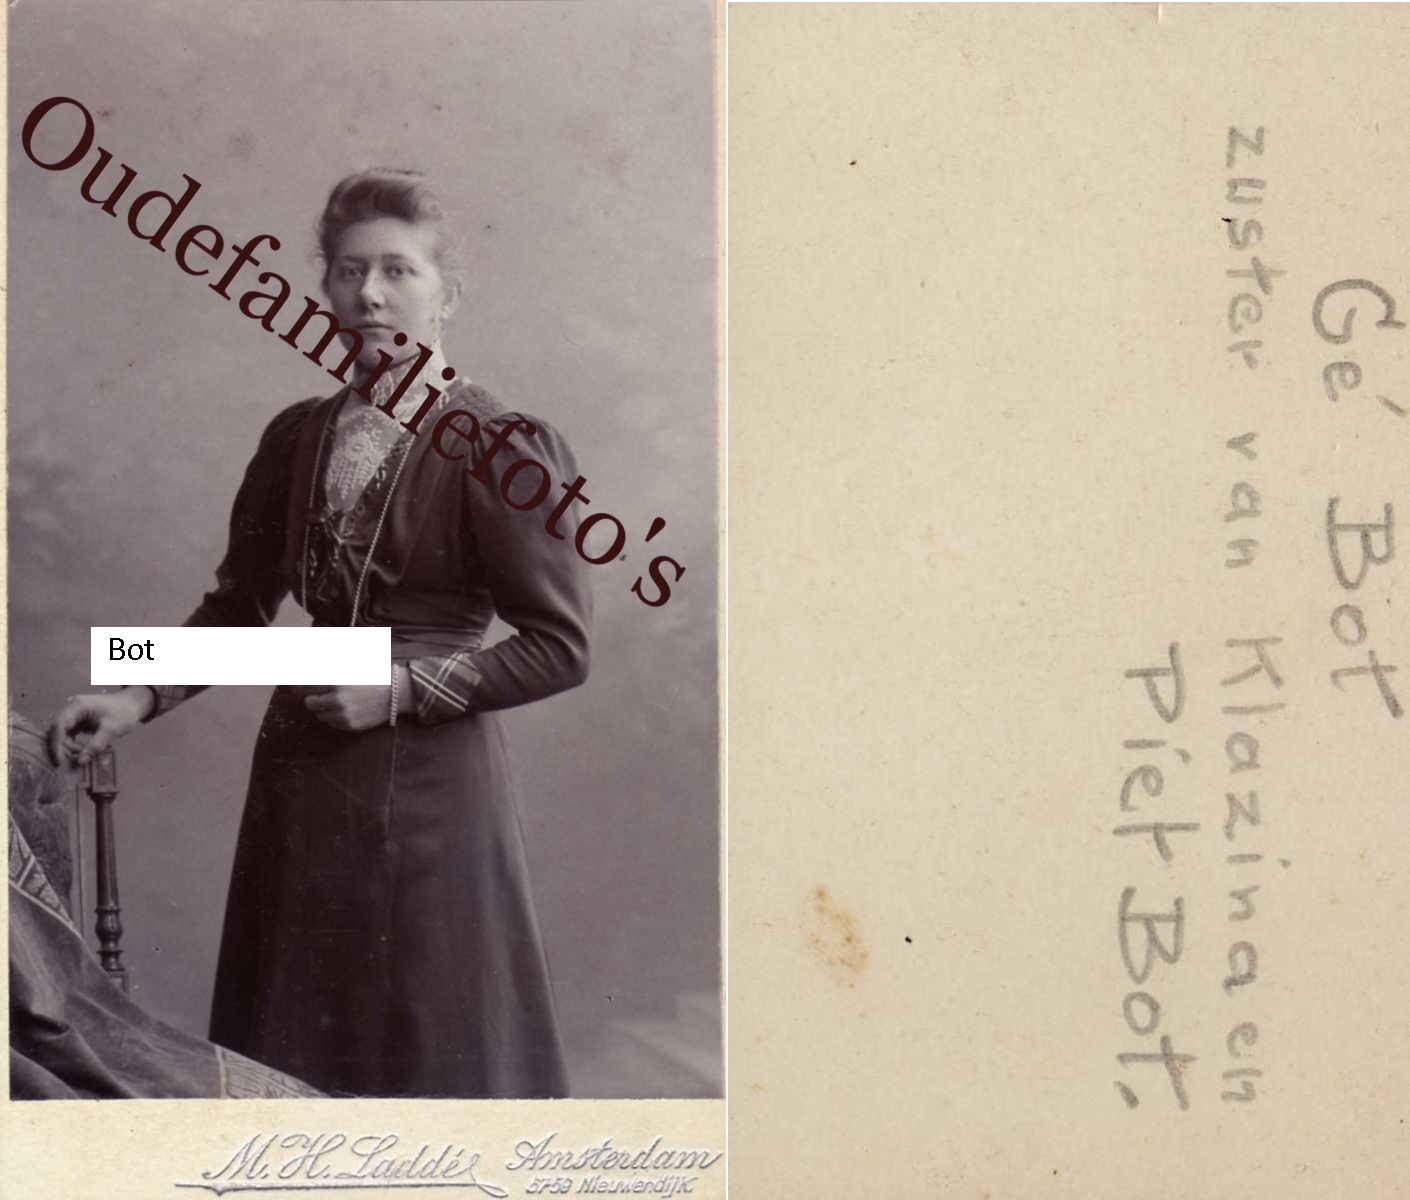 Bot, Geesje Geb. 28-6-1880 Zwartsluis. Ovl. 3-4-1944 Rotterdam € 2,00